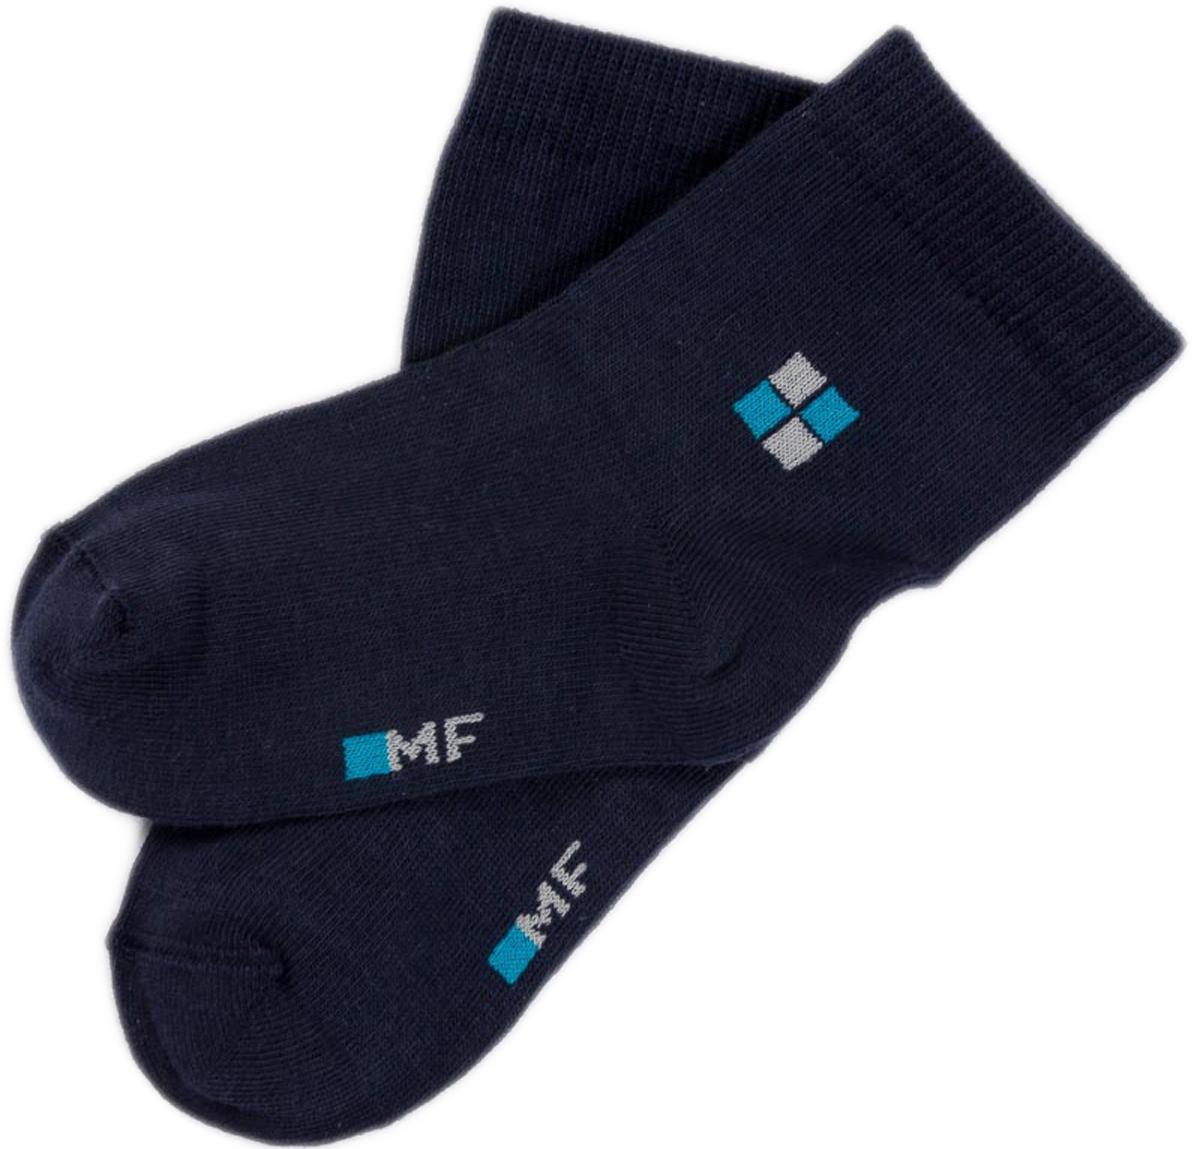 Носки детские Mark Formelle, цвет: темно-синий. 400K-262_B3-6400K. Размер 25/27